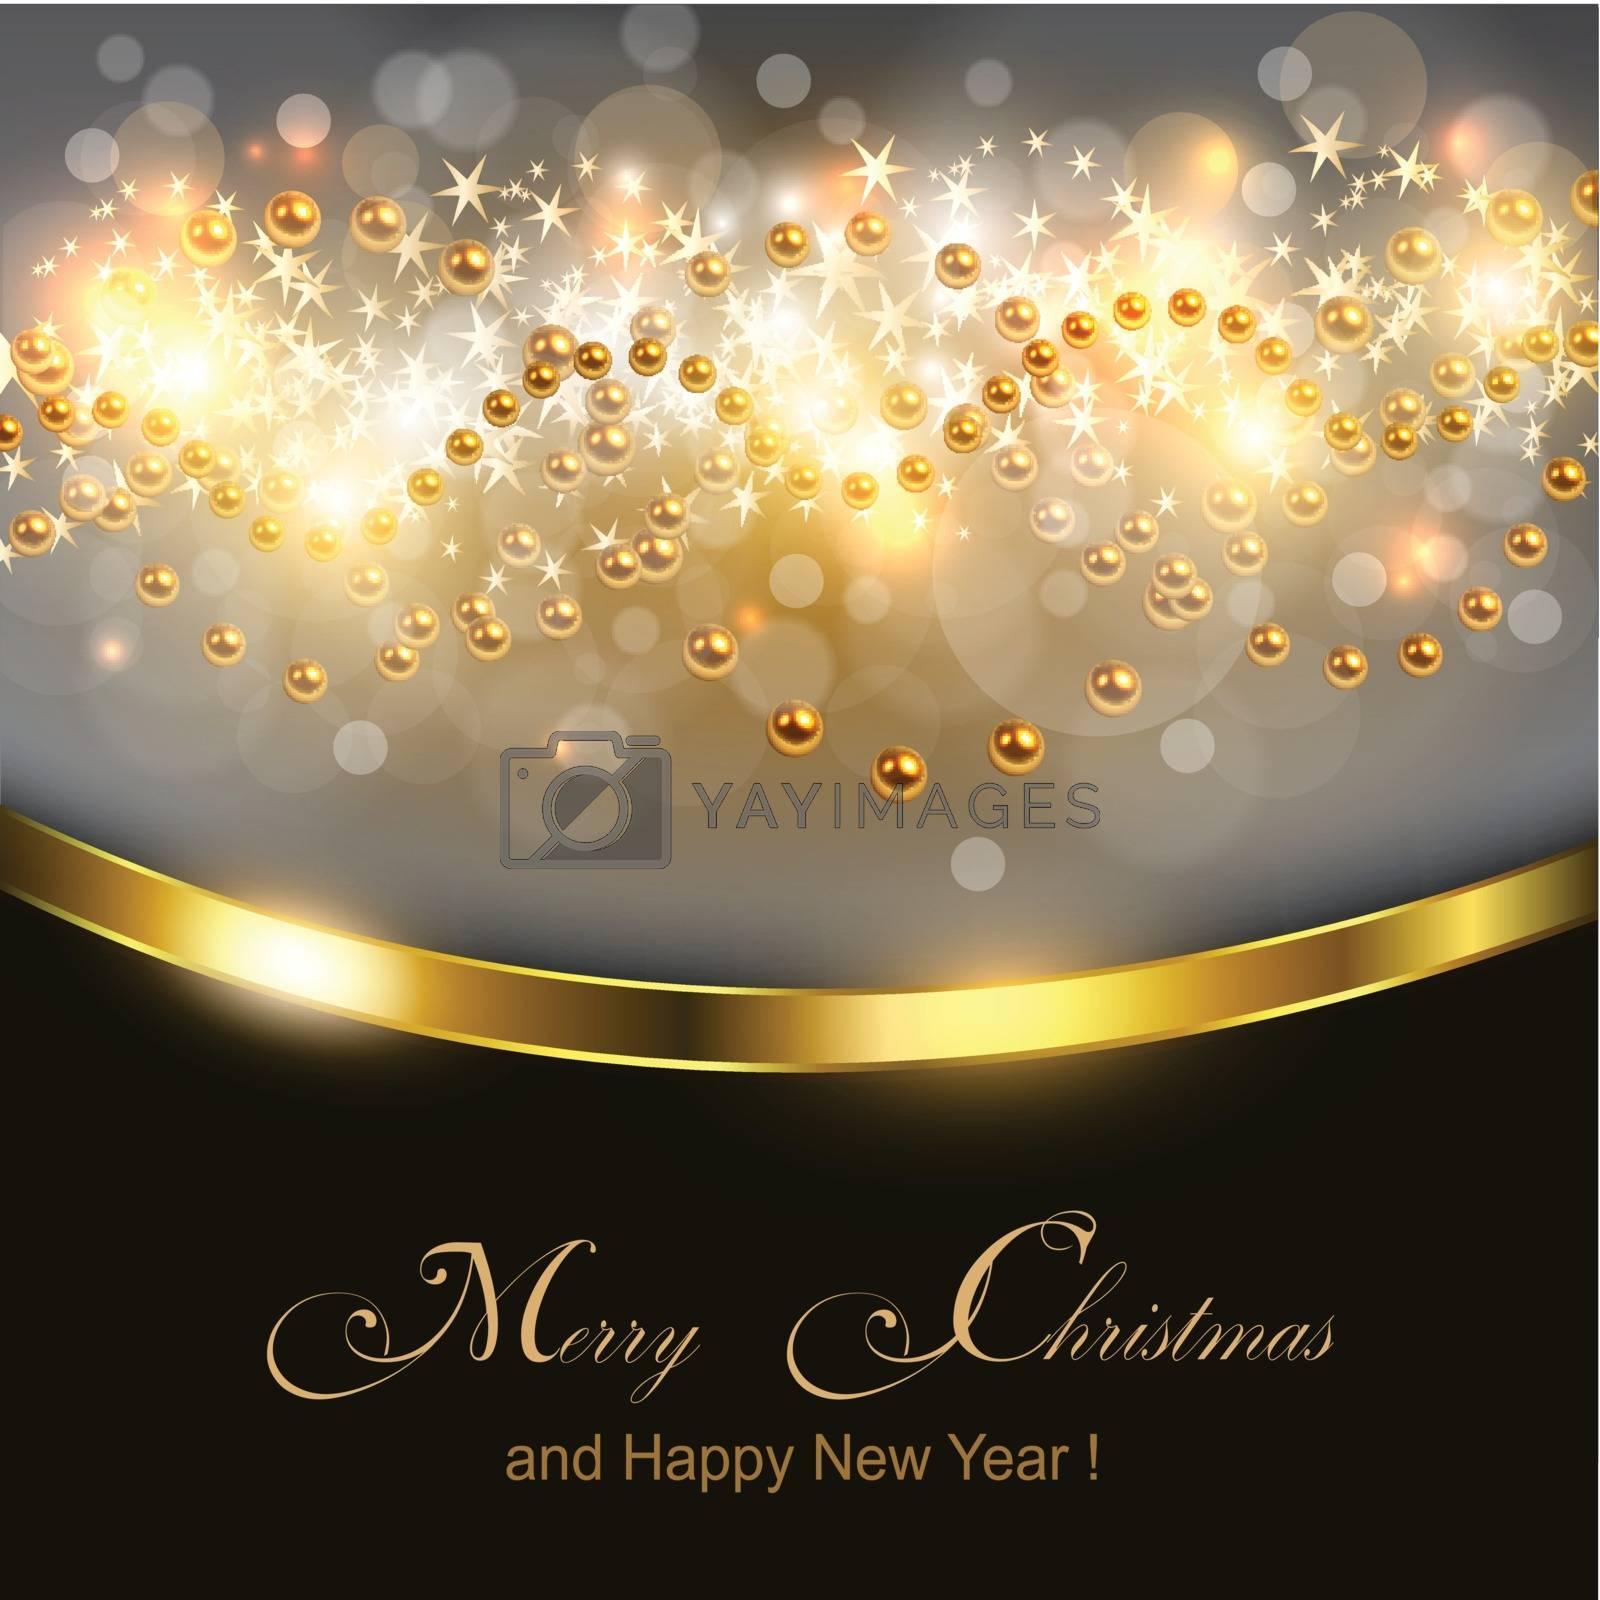 Christmas background gold lights, vector illustration